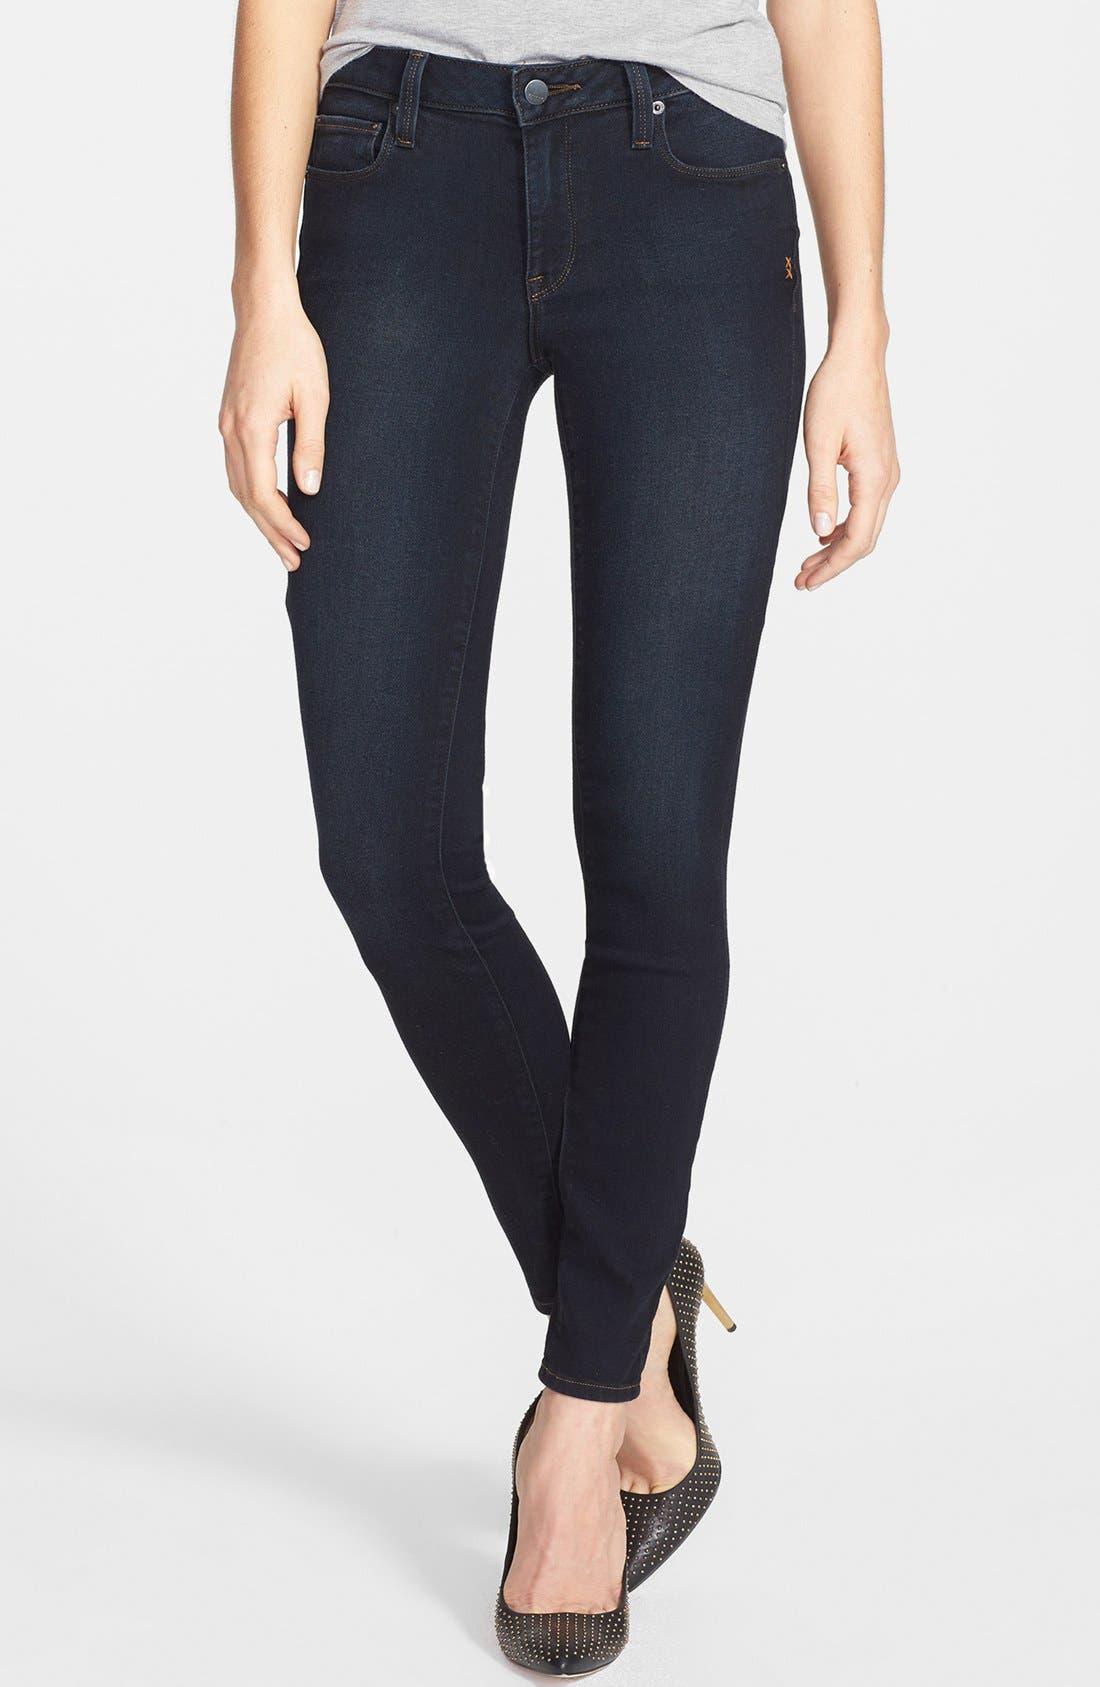 Main Image - Genetic 'The Stem' Cigarette Skinny Jeans (Nomad)